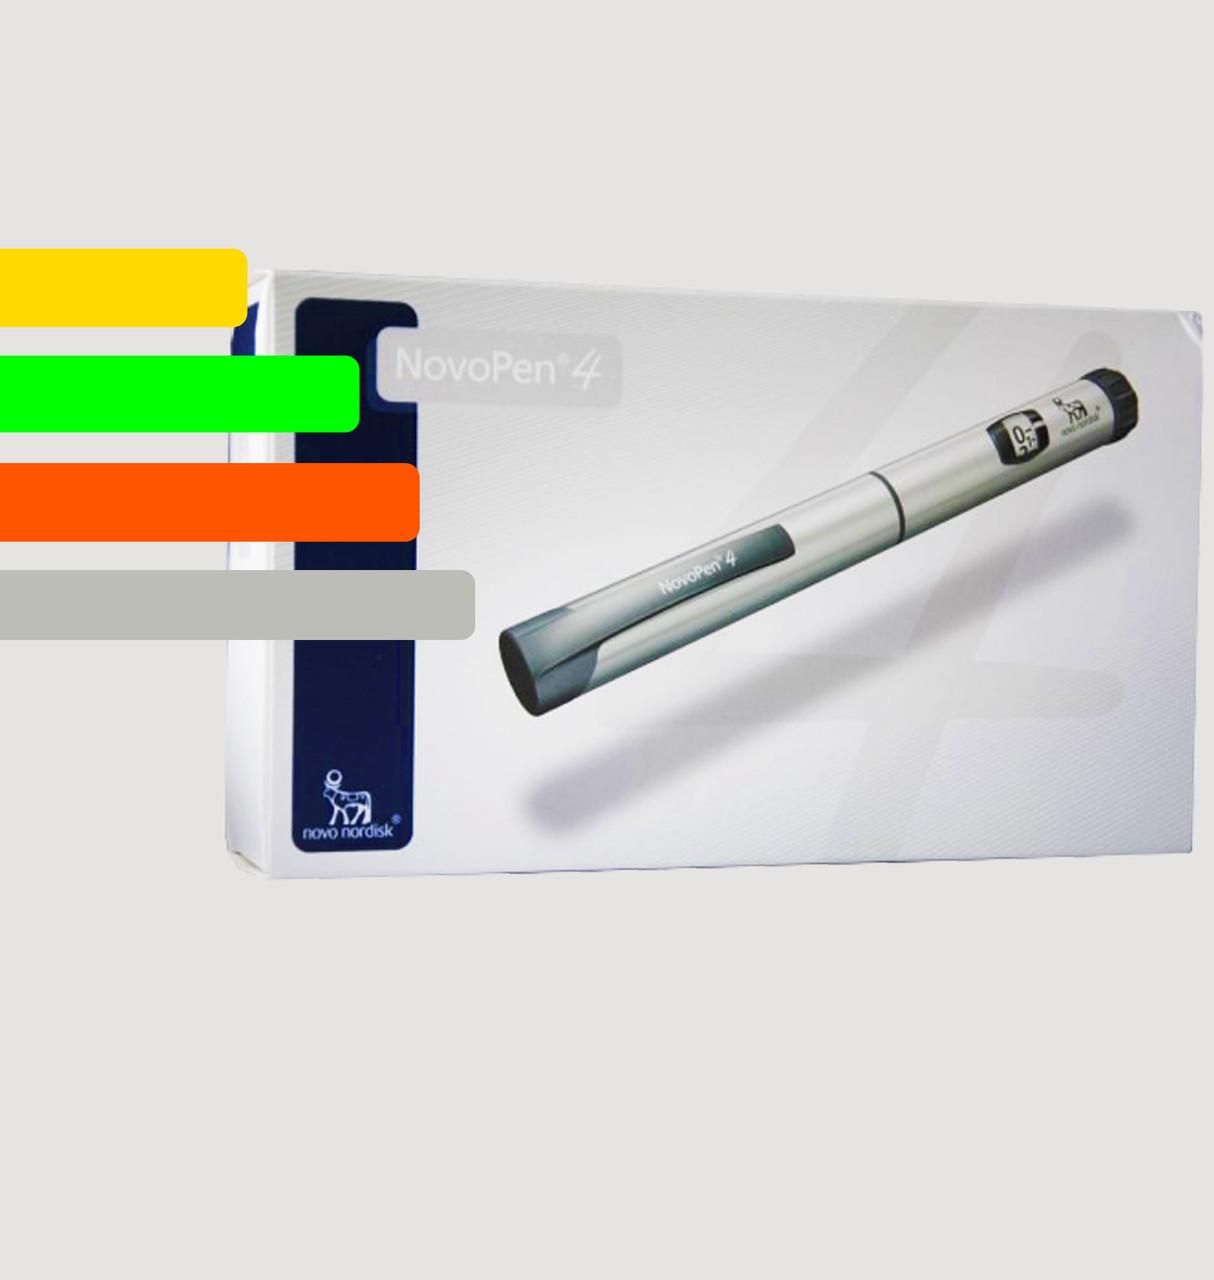 Шприц-ручка для инсулина Новопен 4